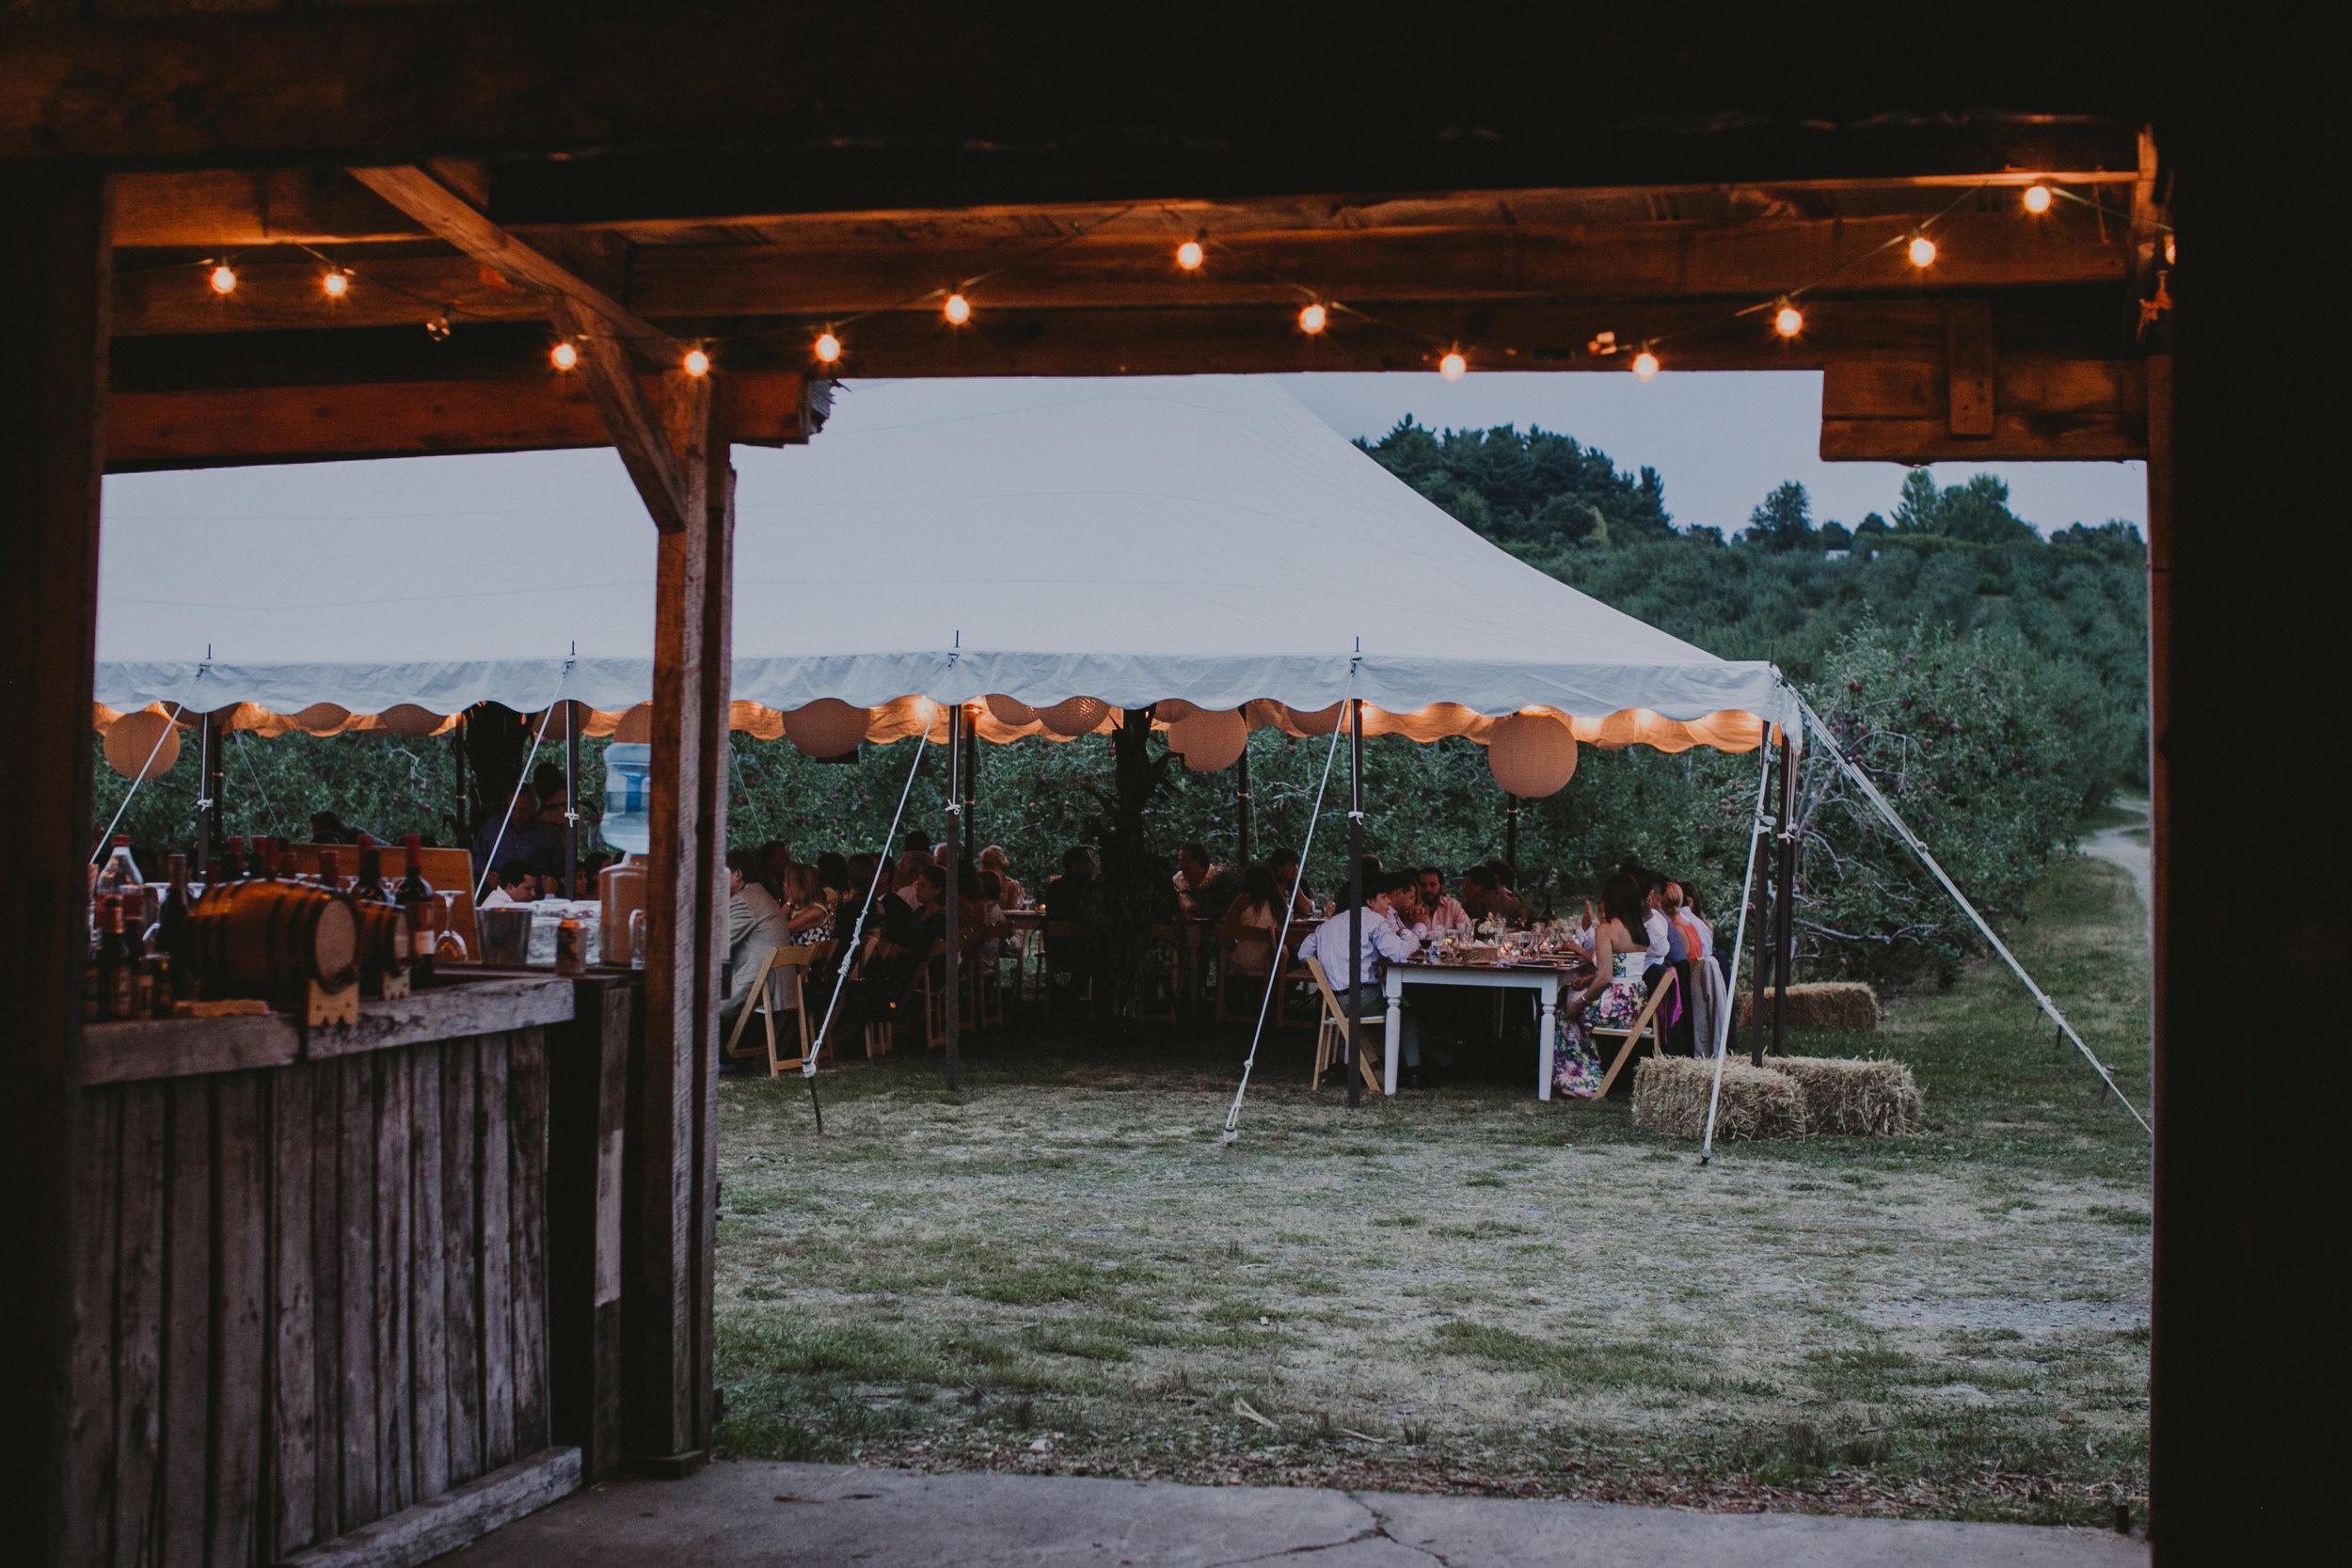 LIBERTY_VIEW_FARM_HIGHLAND_NY_WEDDING_CHELLISE_MICHAEL_PHOTOGRAPHY869.JPG